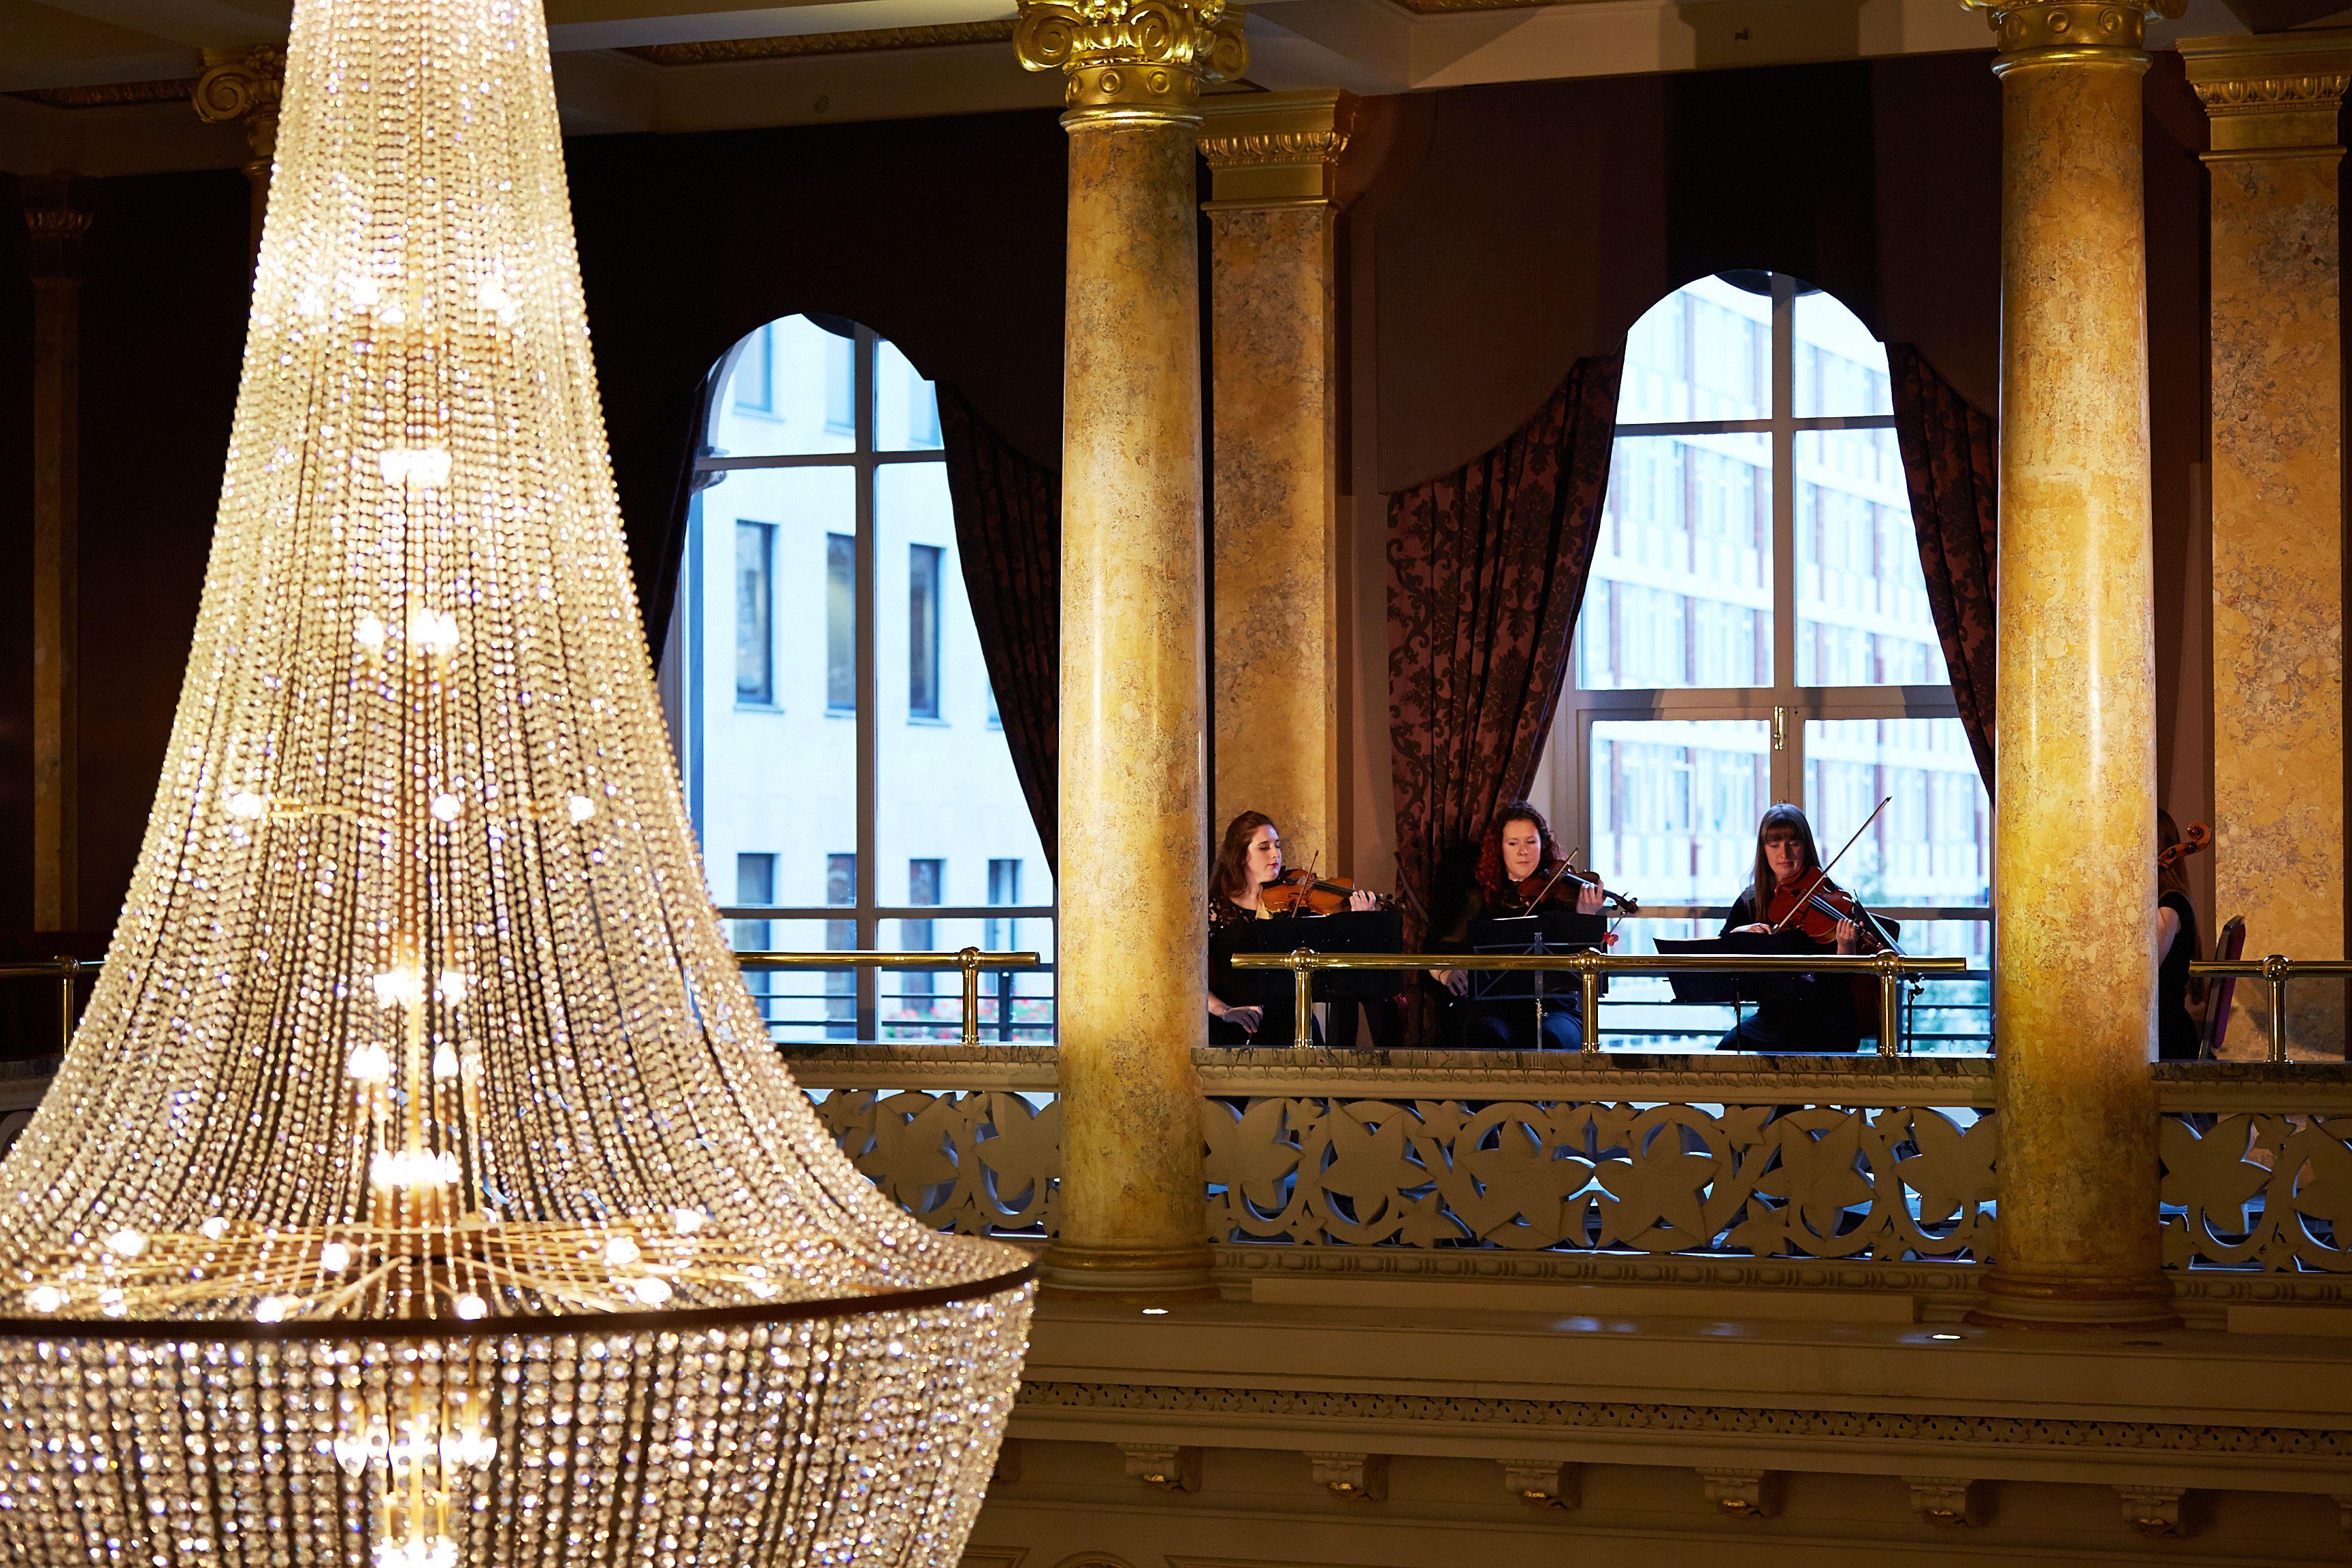 Chandelier In The Grosvenor Hotel Grosvenor Hotel London London Hotels Hotel